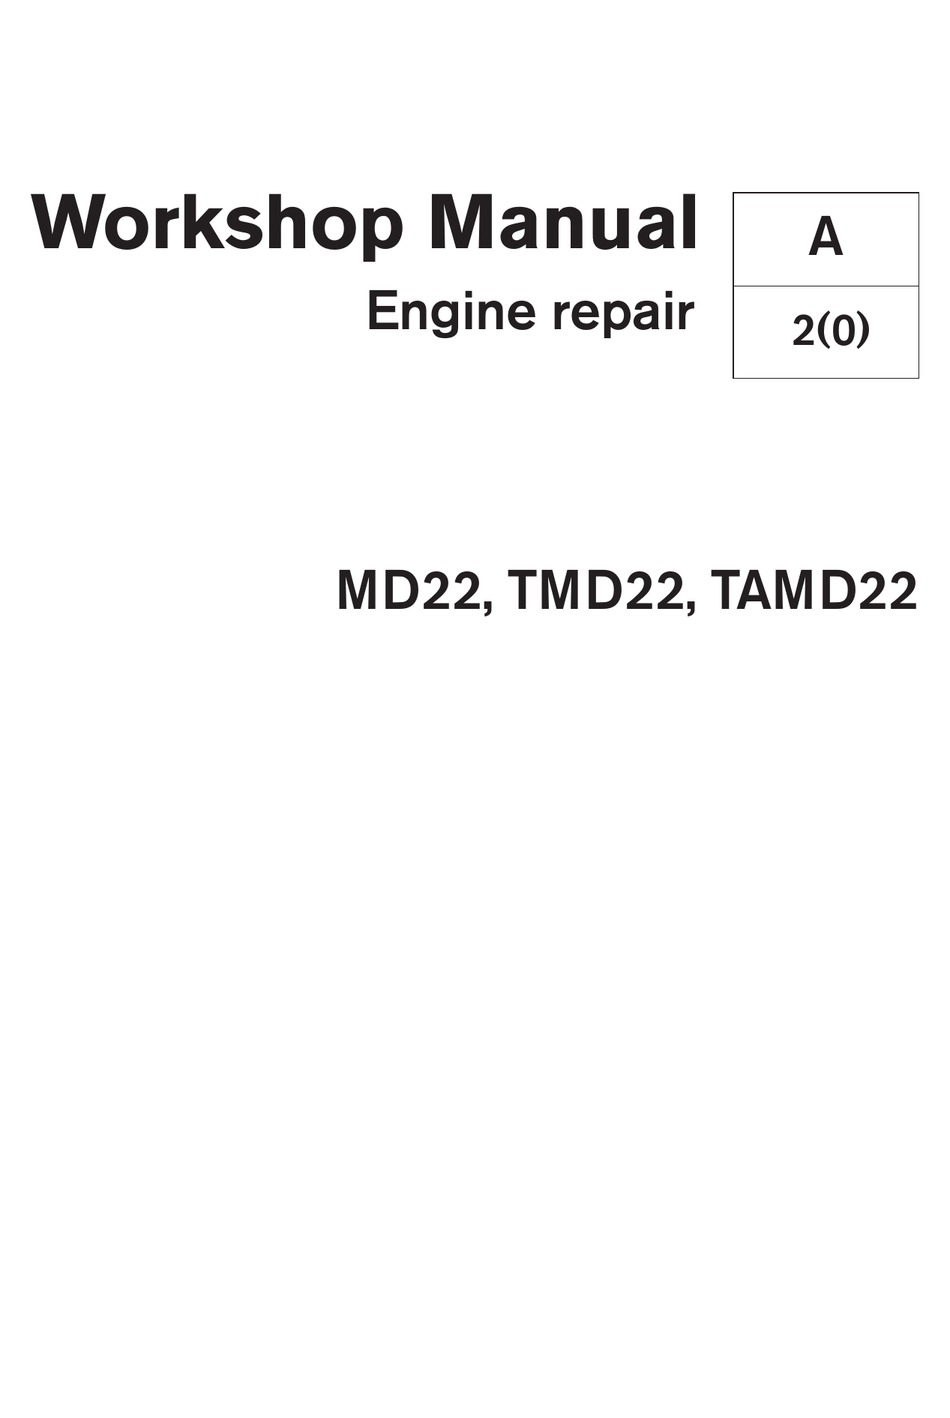 VOLVO PENTA MD22 WORKSHOP MANUAL Pdf Download | ManualsLib | Volvo Marine Camshaft Position Sensor Wiring Diagram |  | ManualsLib